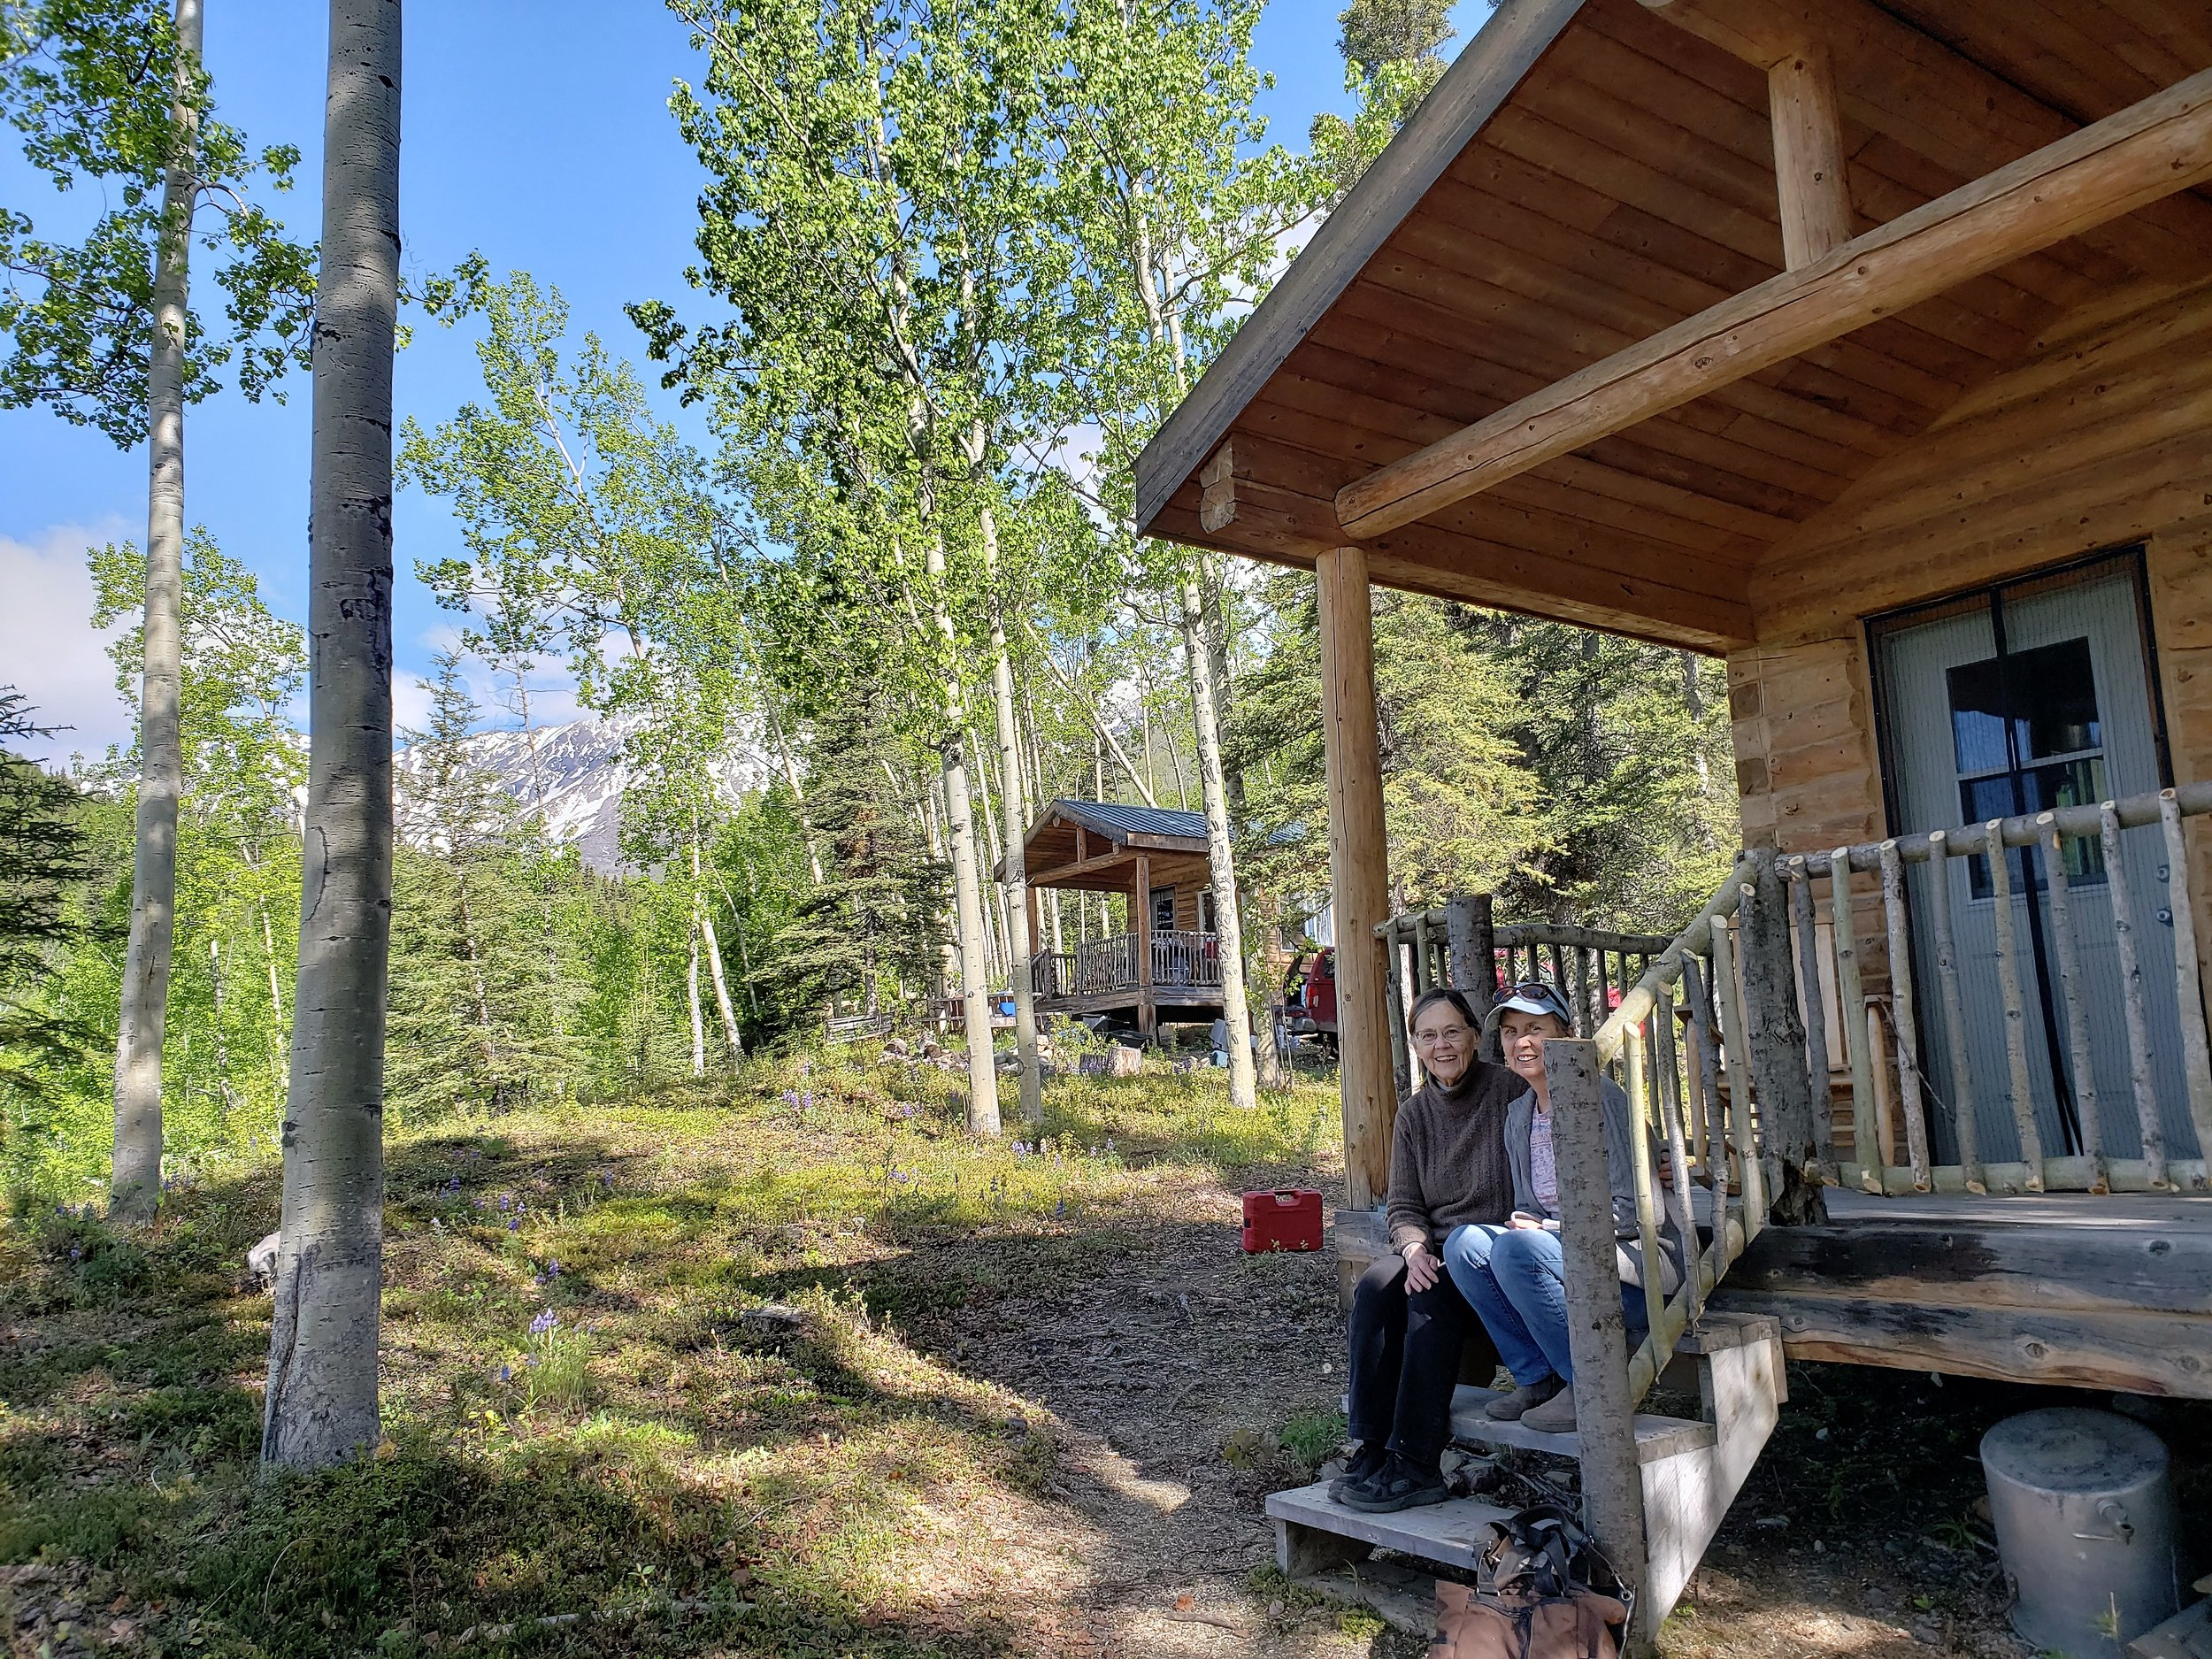 Swift Creek Cabin guests